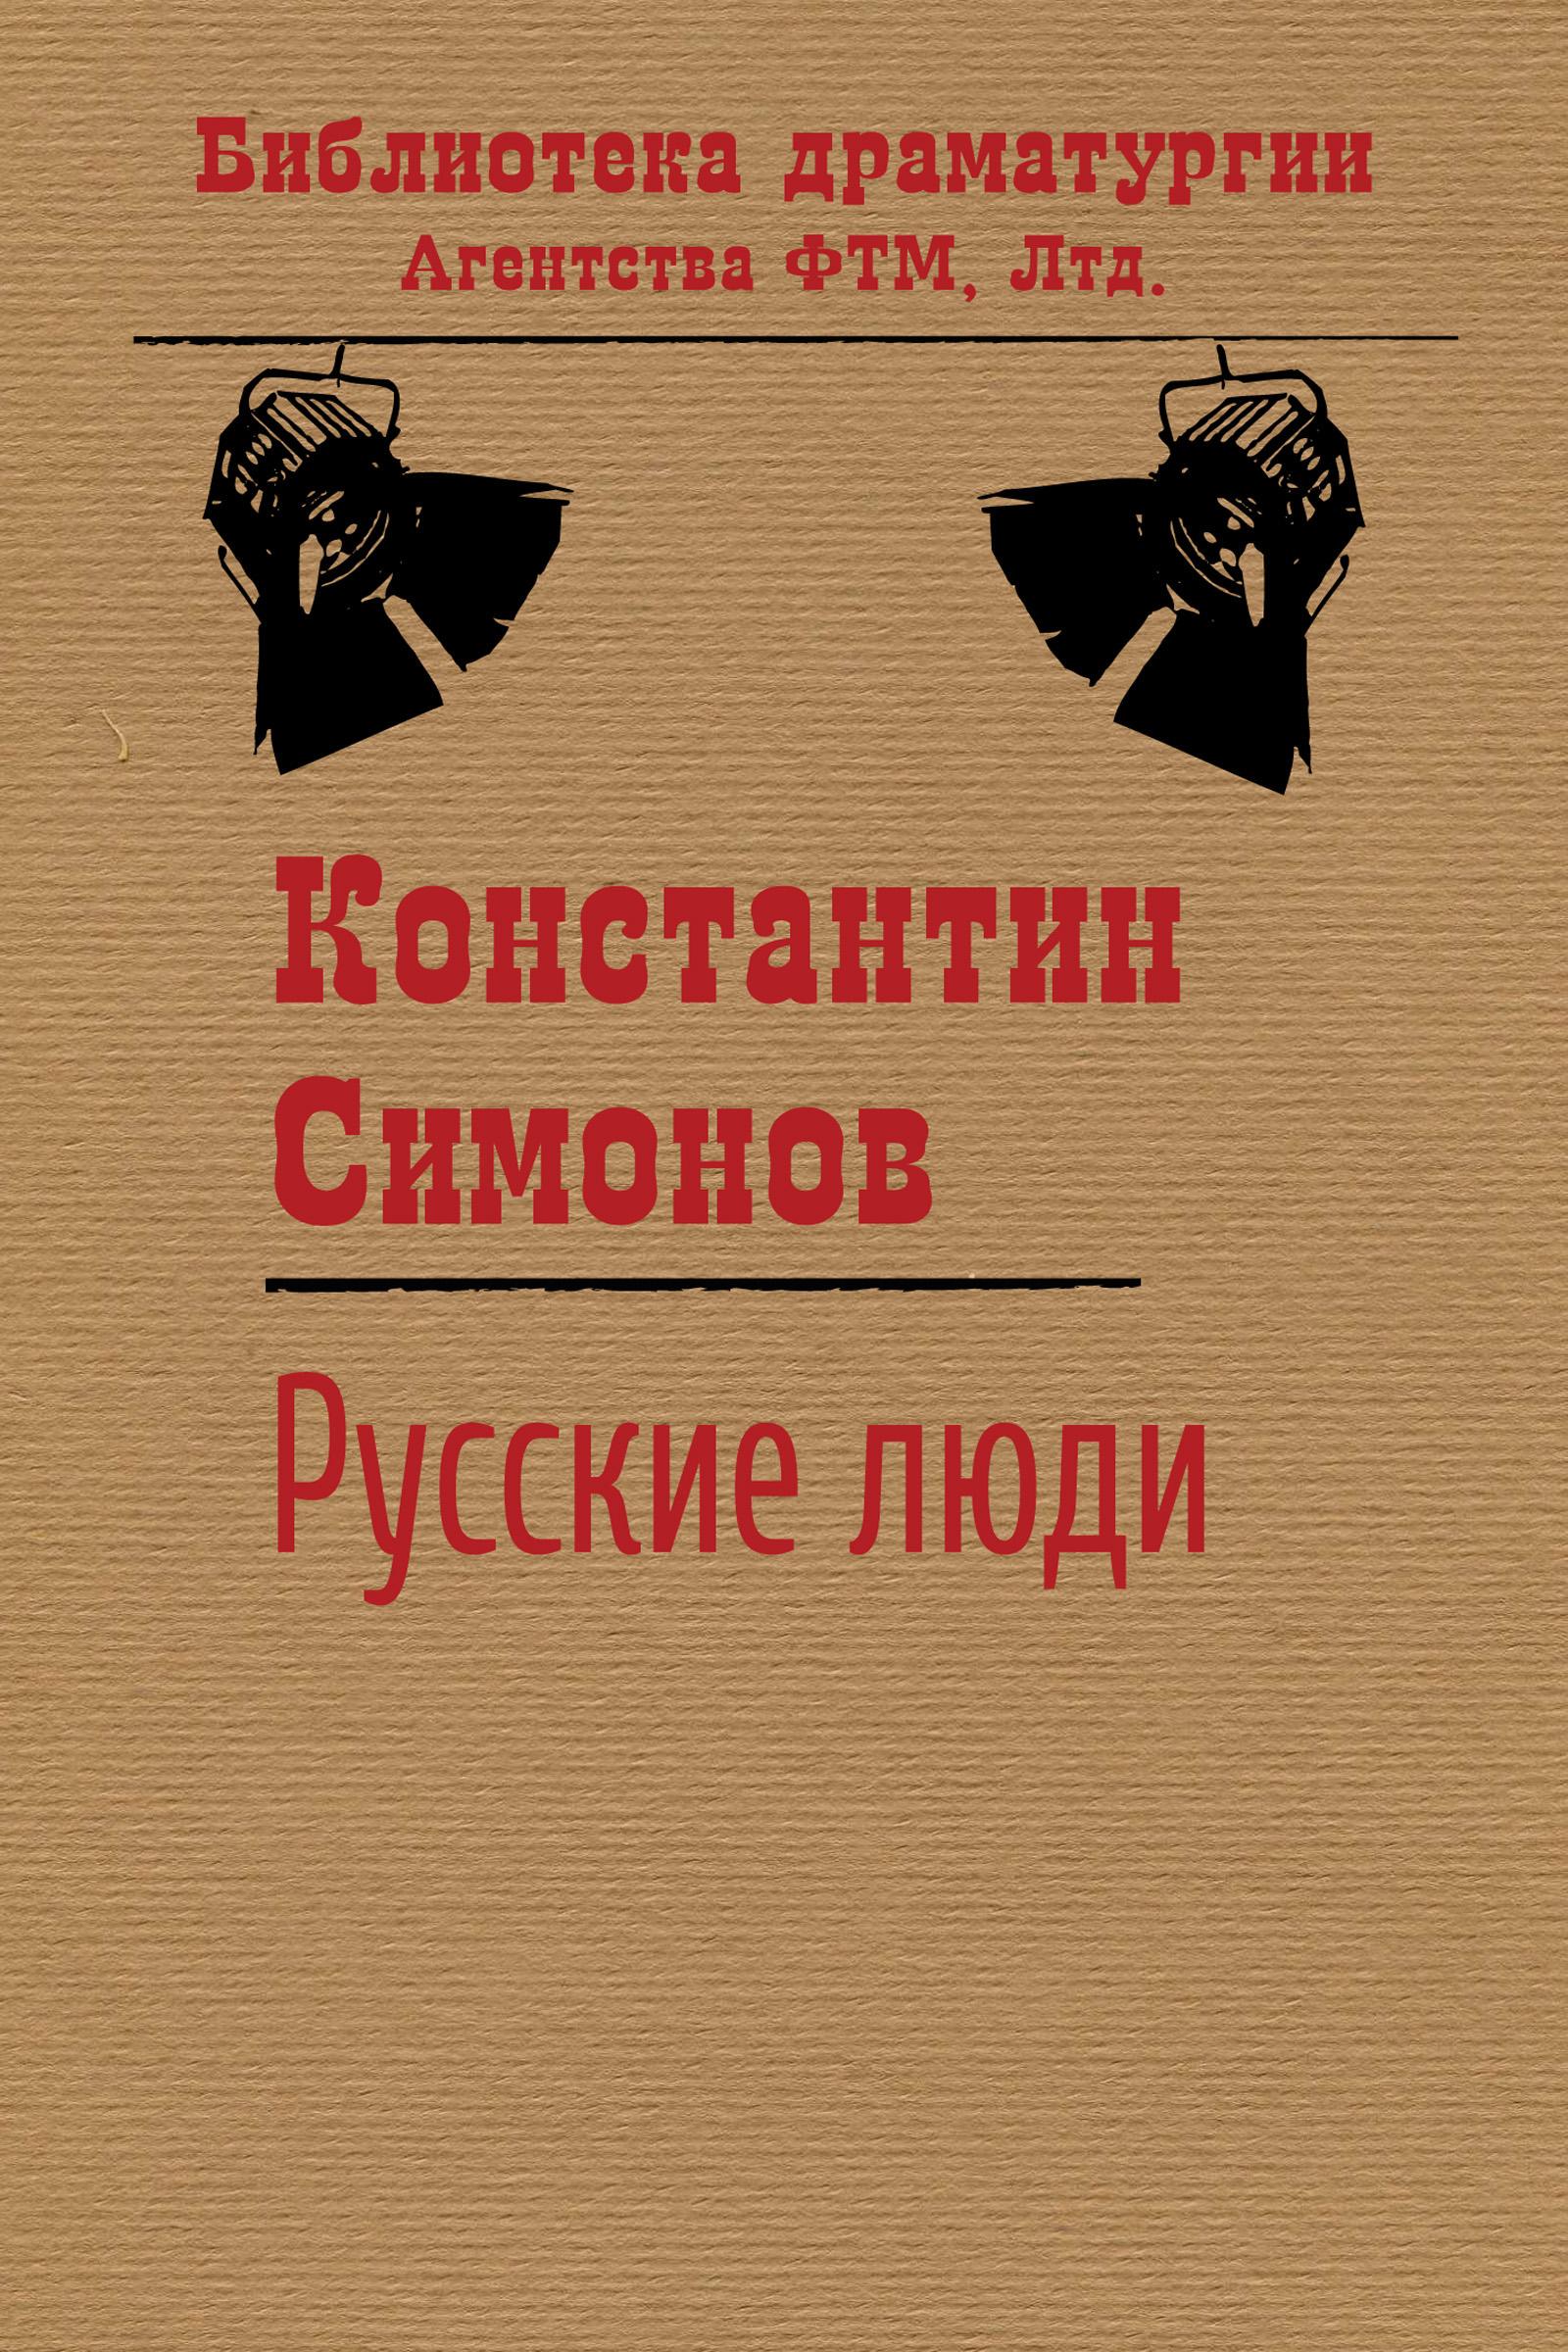 russkie lyudi